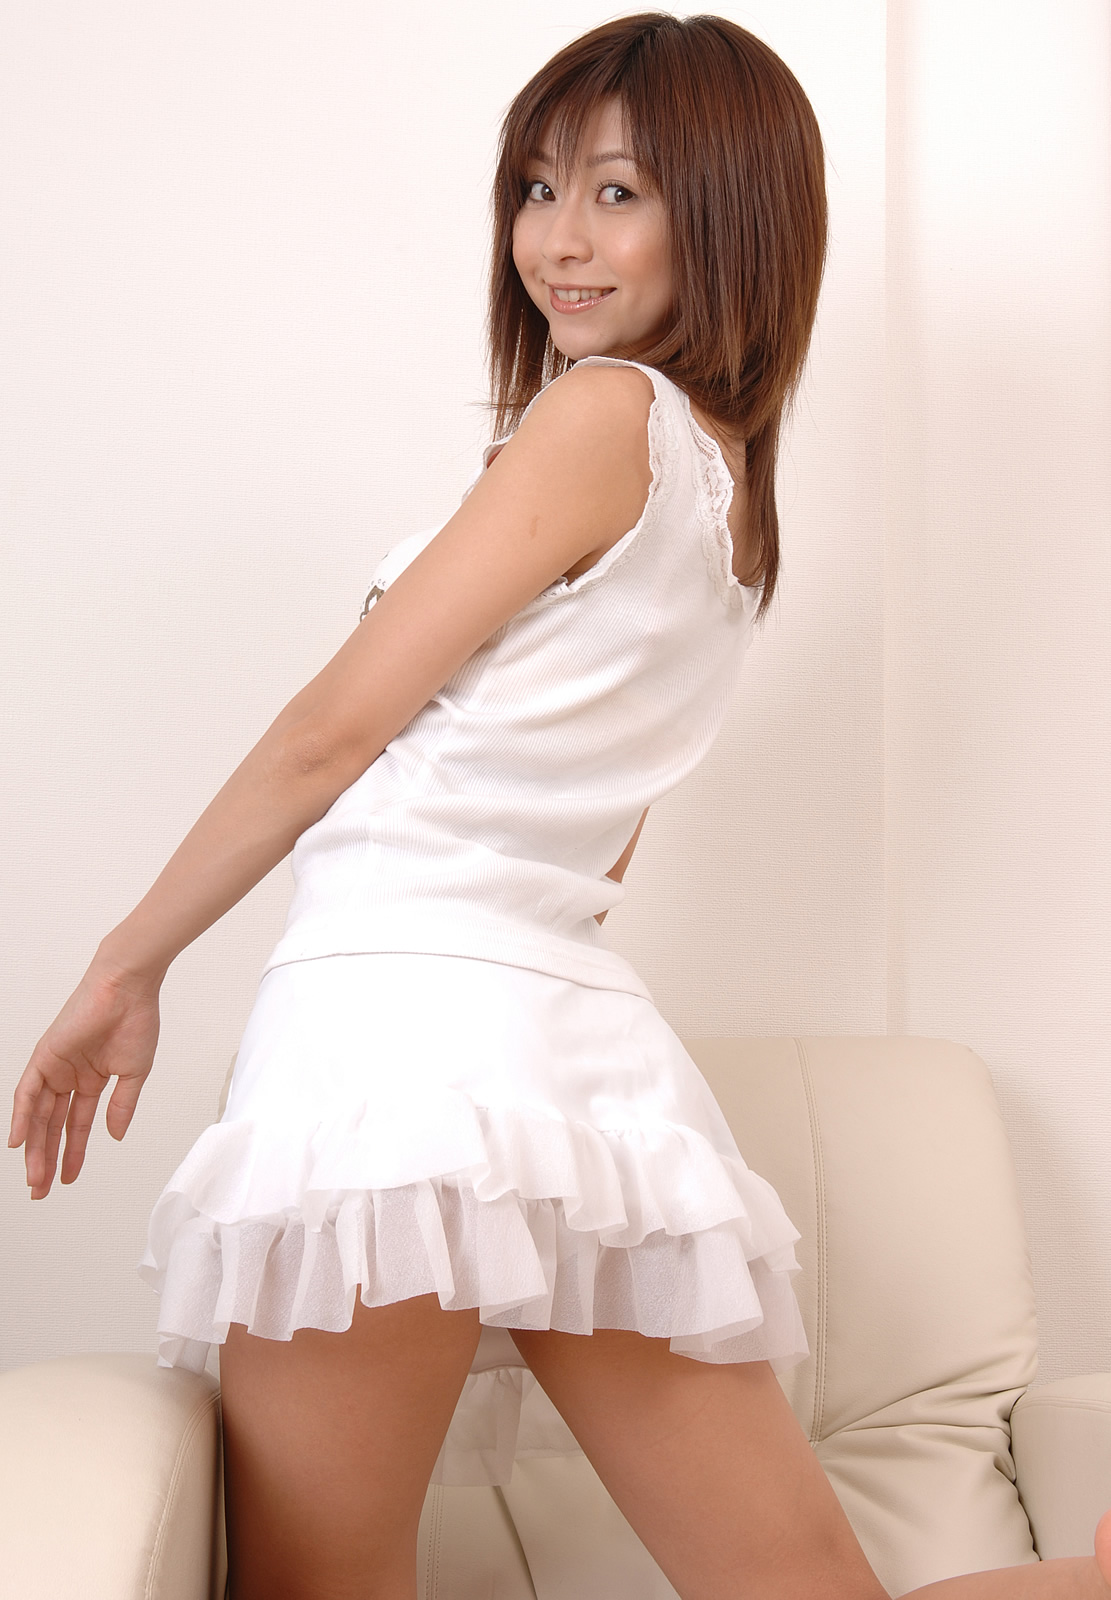 Attractive Cute Nude Girl Pretty Pictures